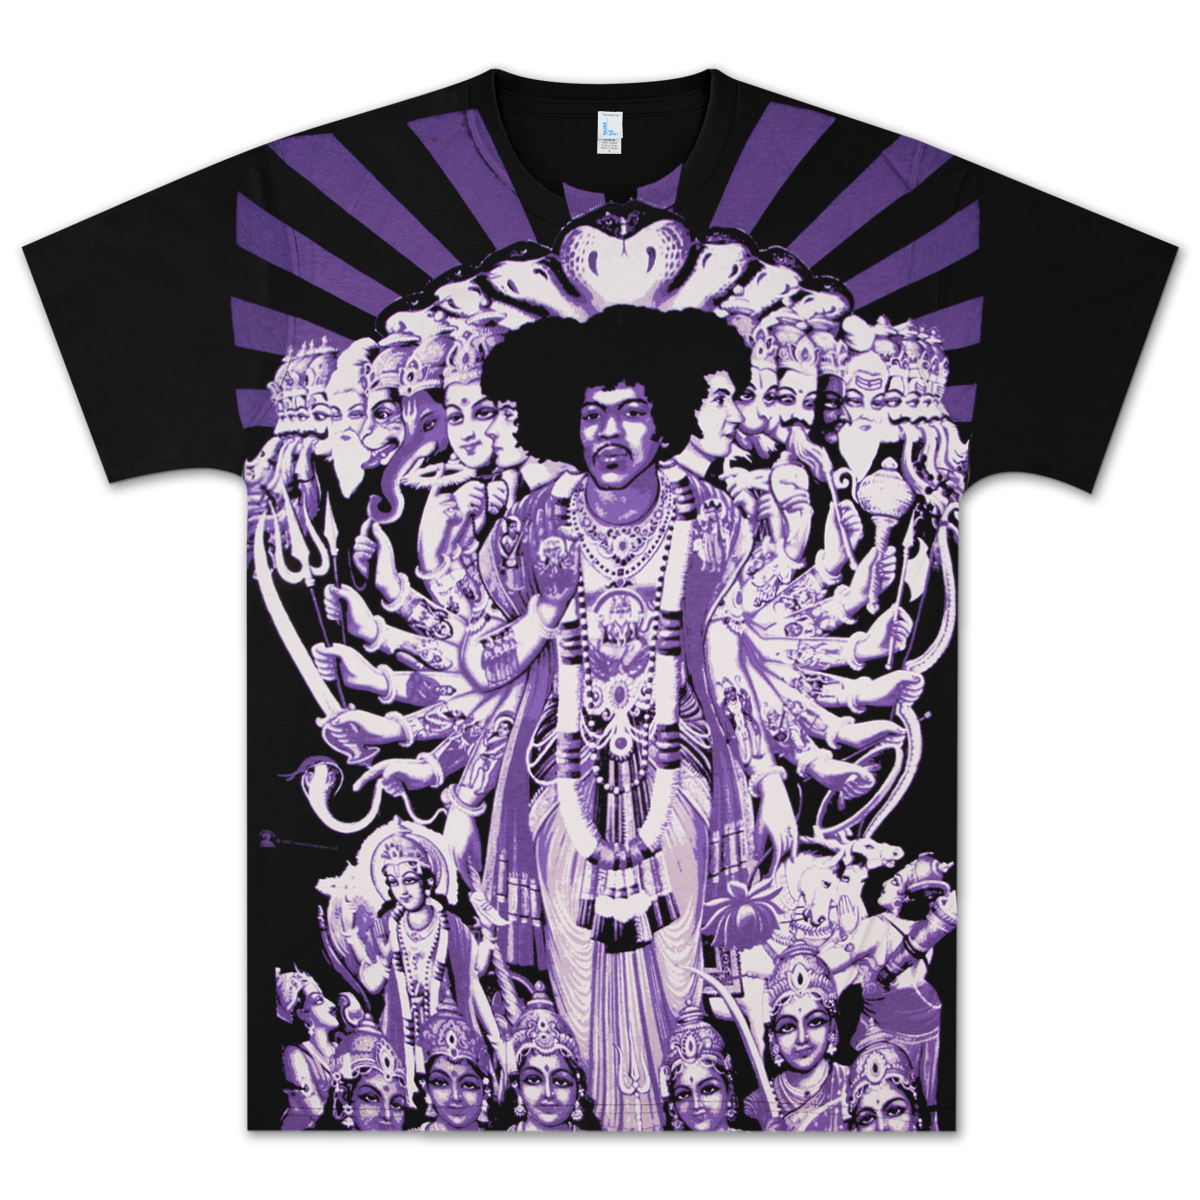 Jimi Hendrix Bold As Love T-Shirt